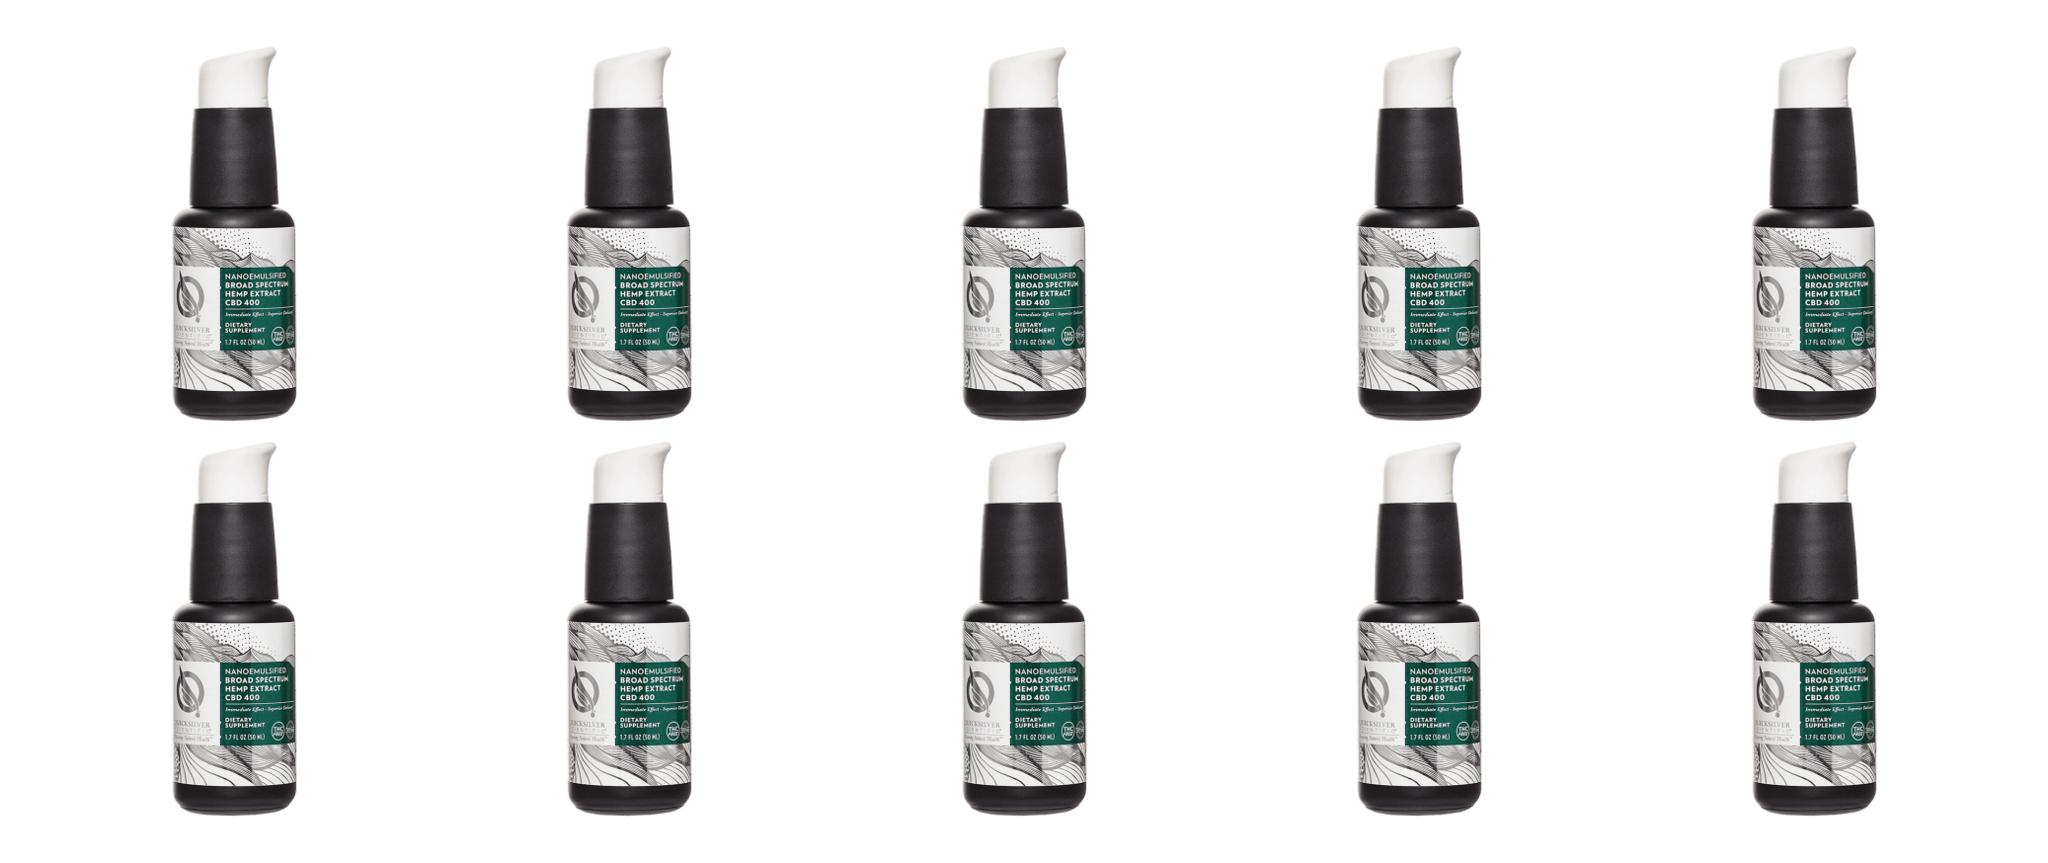 Quicksilver Scientific Broad Spectrum Hemp Extract, 50 ml, 10-pack